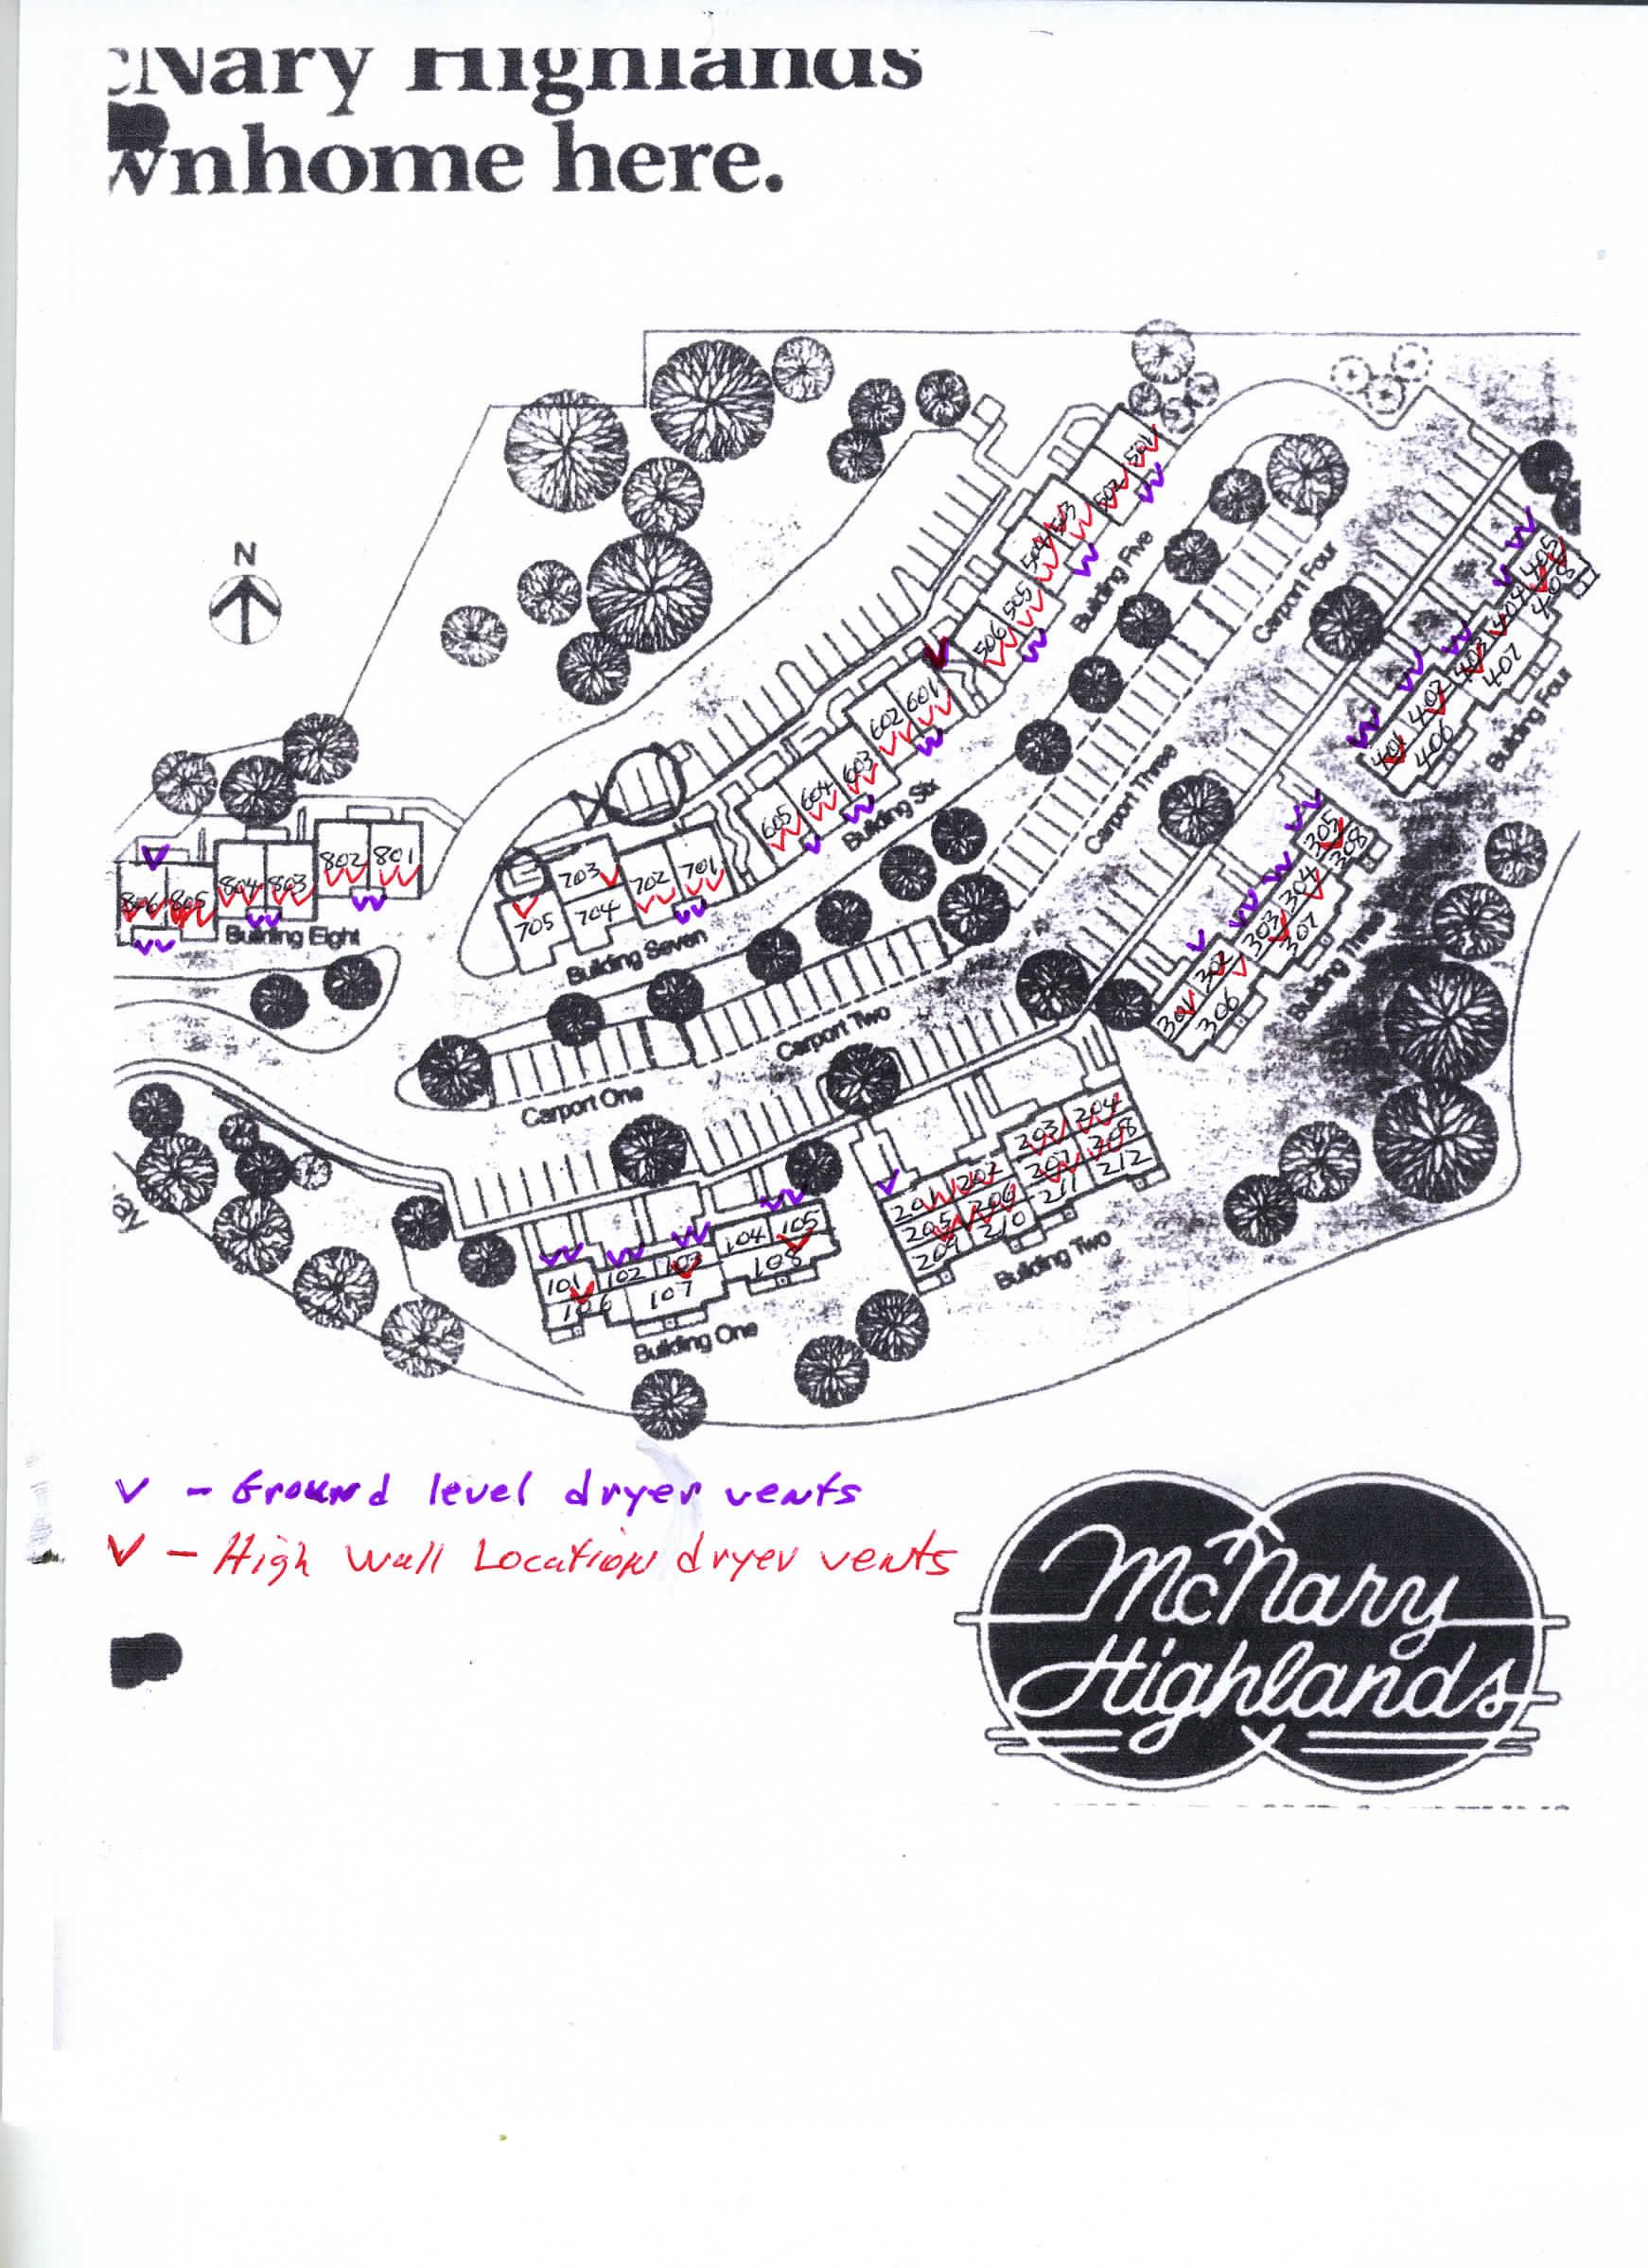 McNary Highlands HOA Site Plan